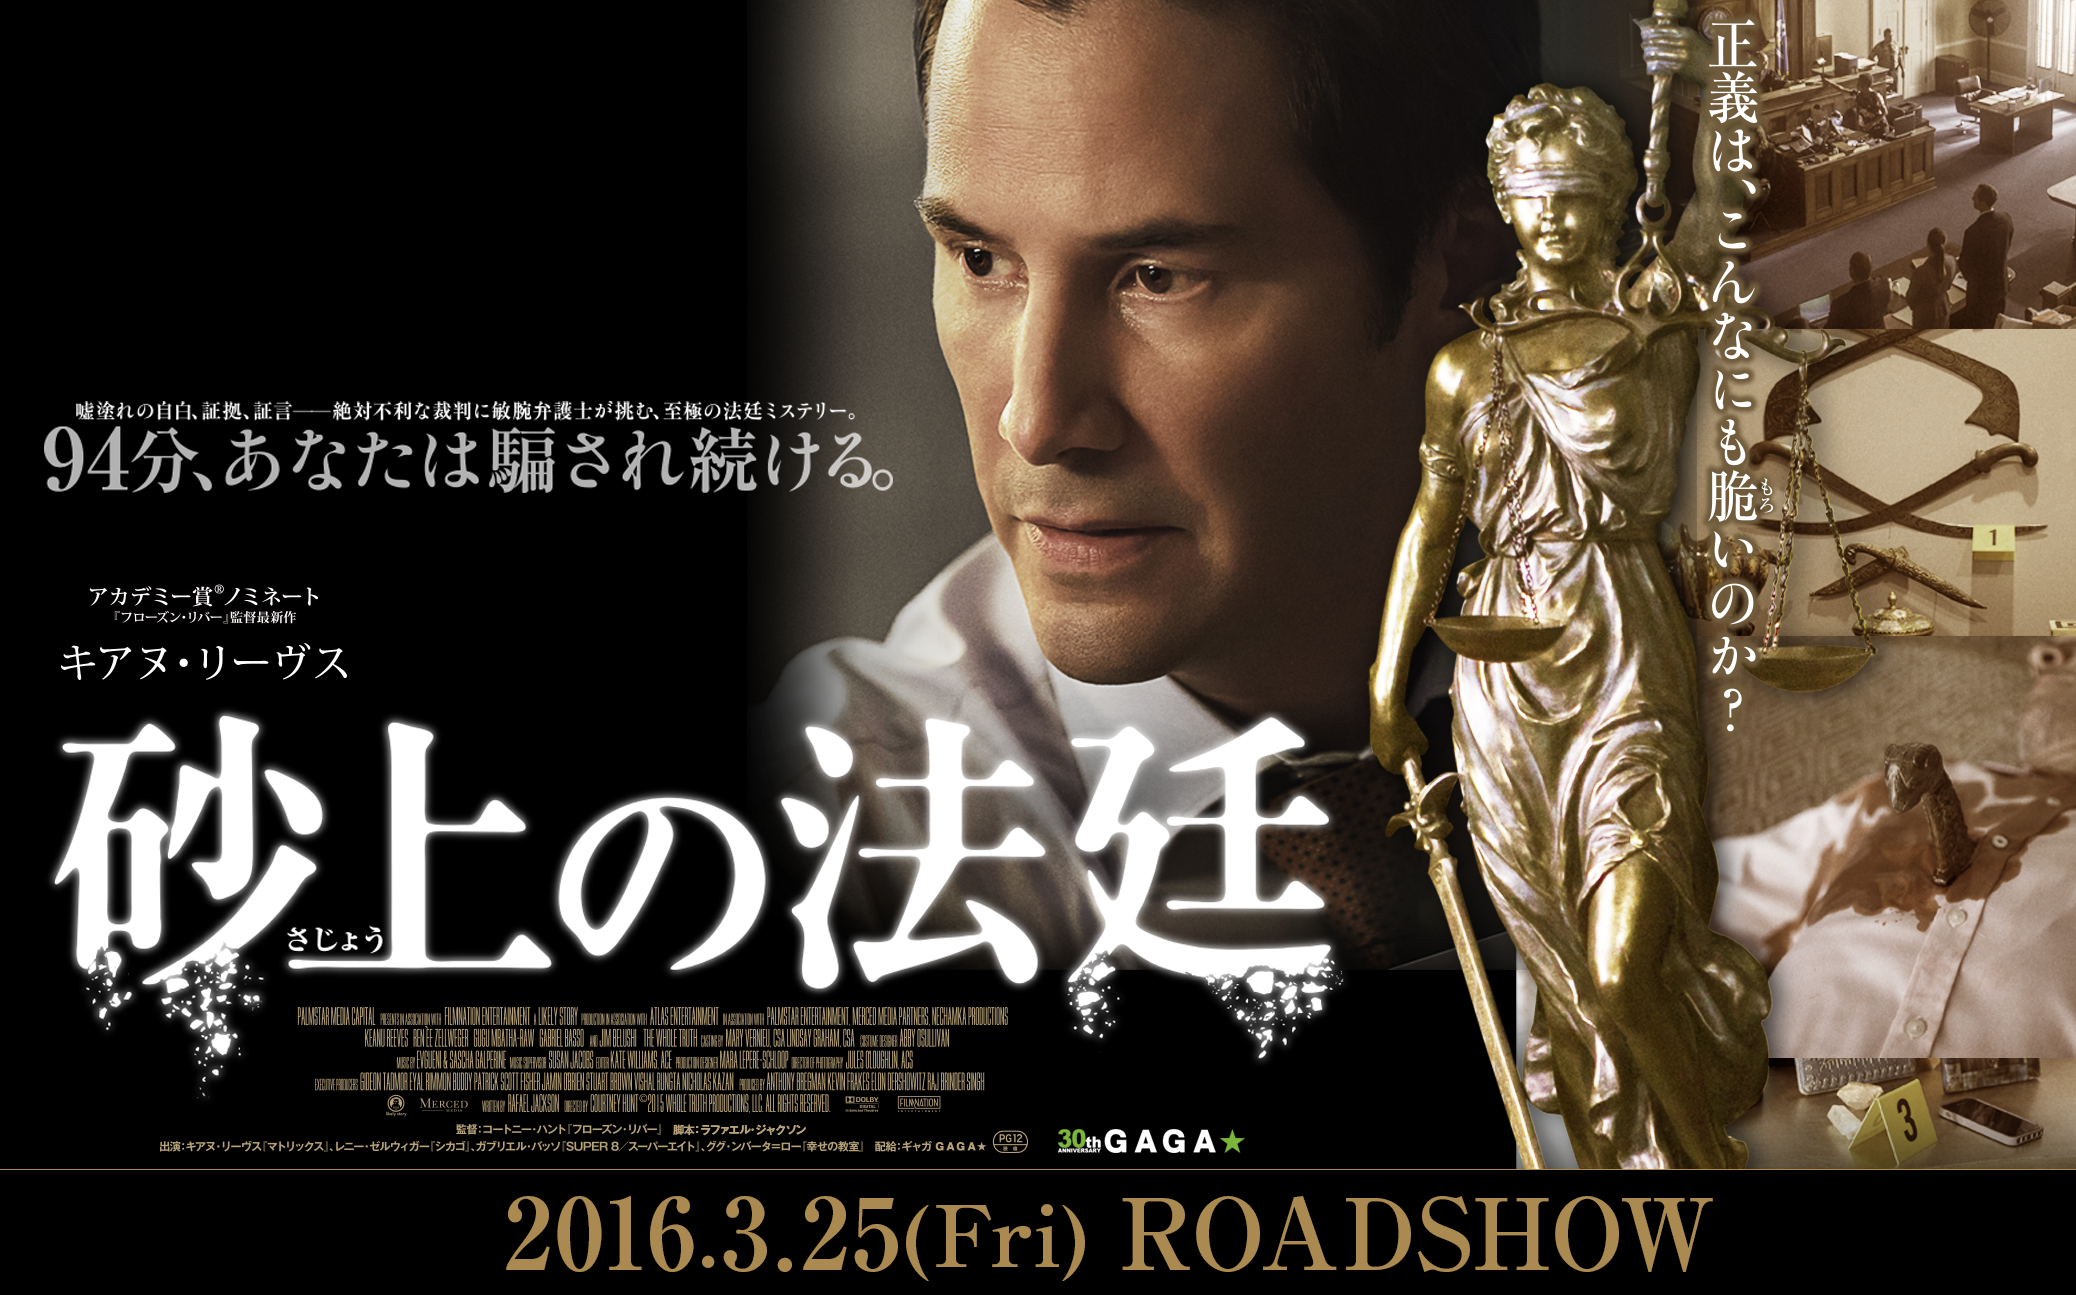 https://gaga.ne.jp/sajou/images/main_pc03.png